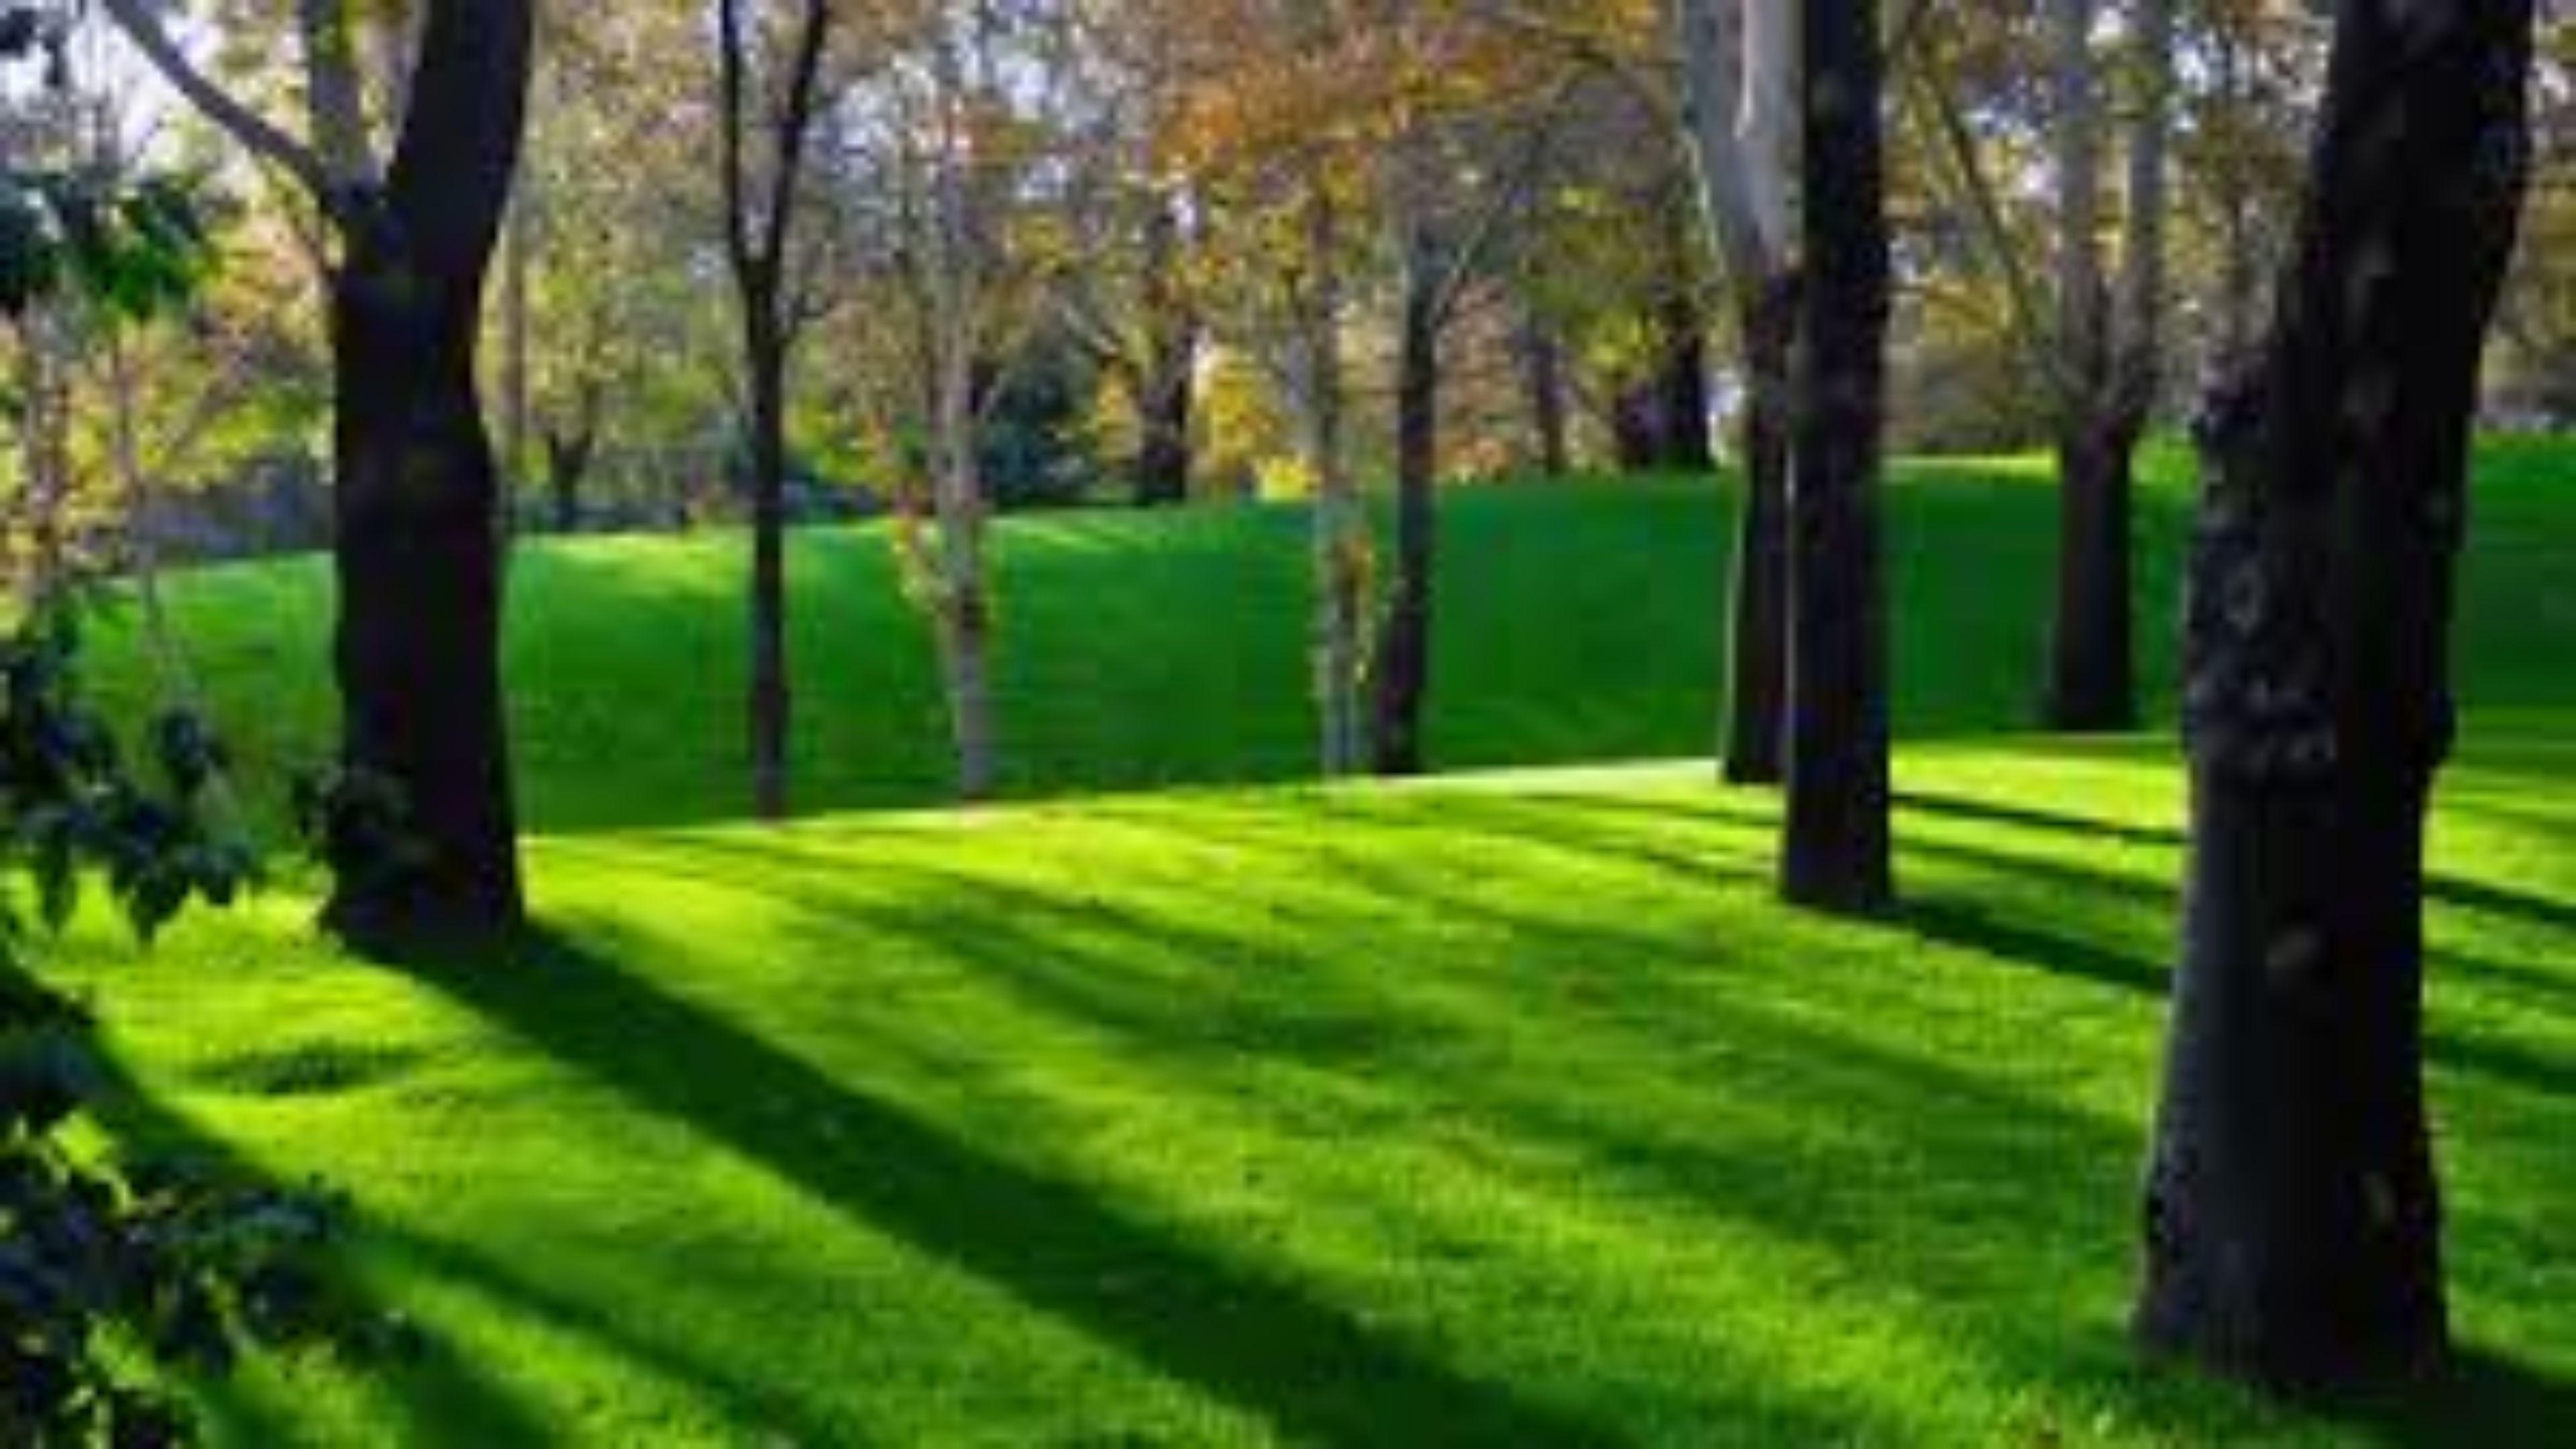 1920x1080 Hd Wallpaper Nature Green